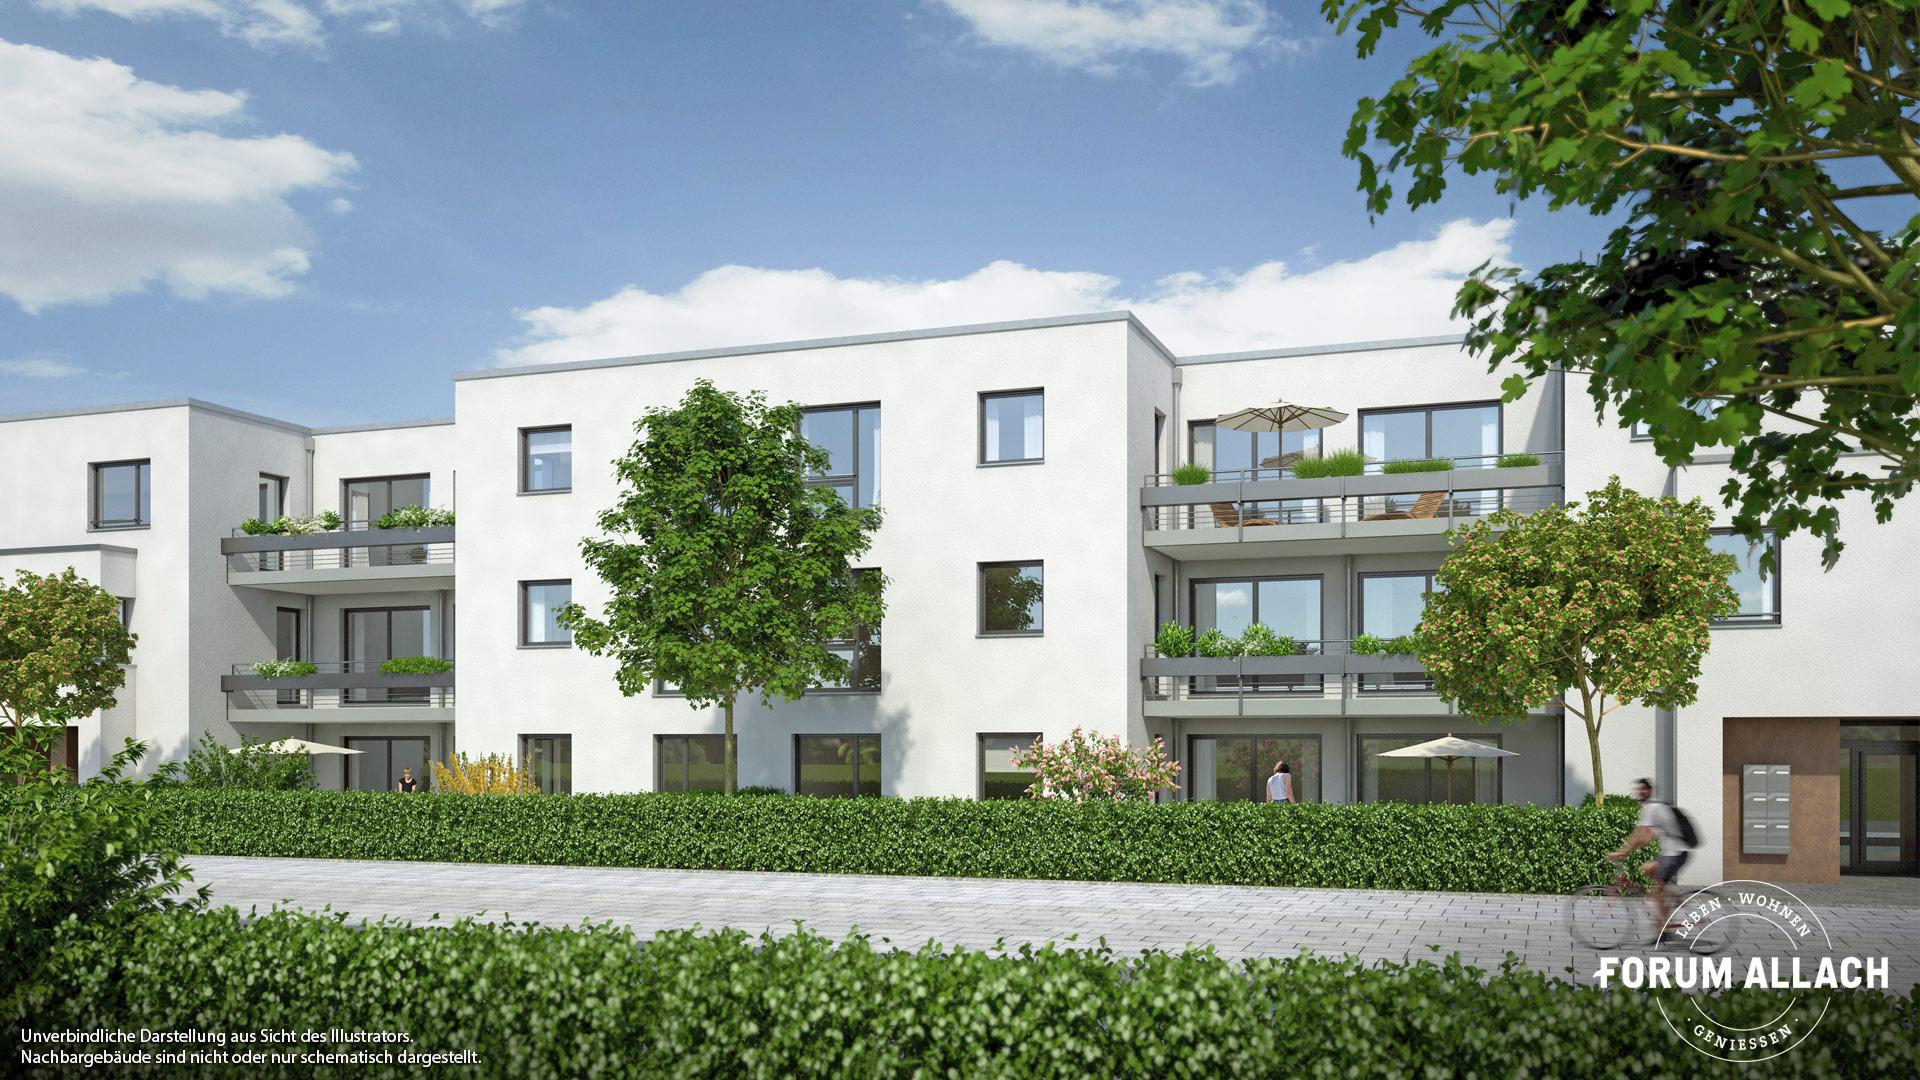 Immobilie Forum Allach - Illustration 4